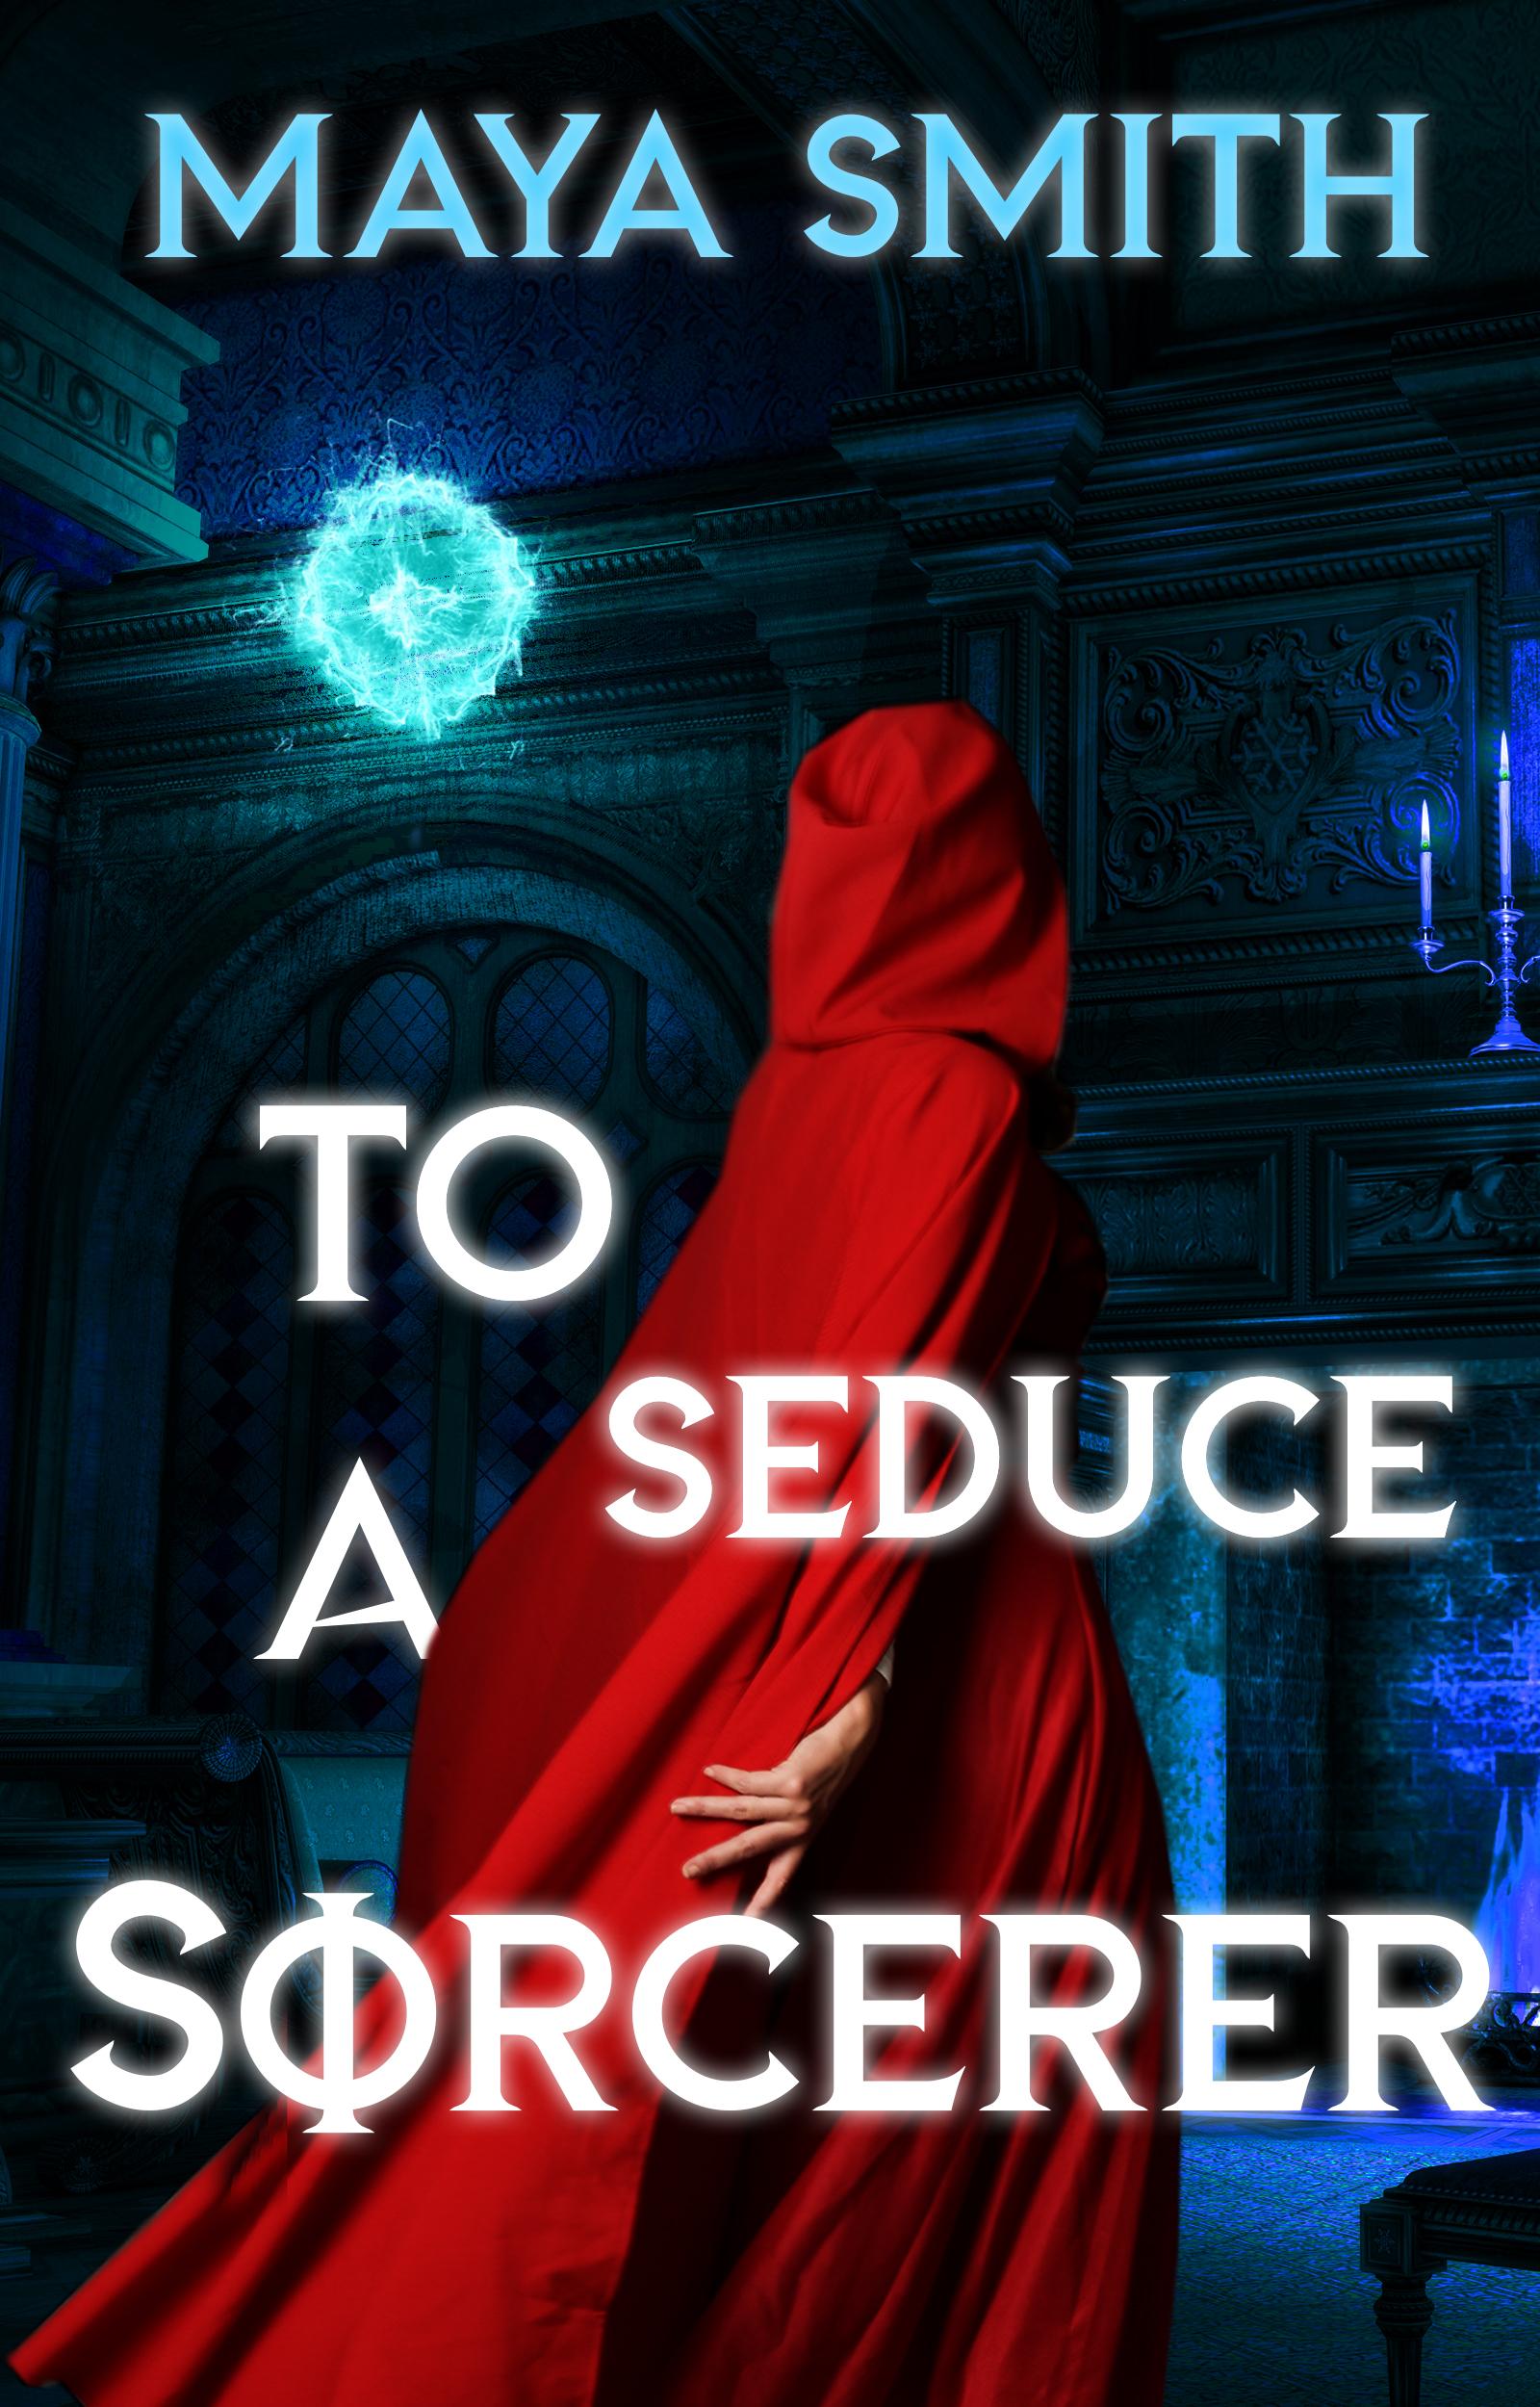 Seduce A Sorcerer